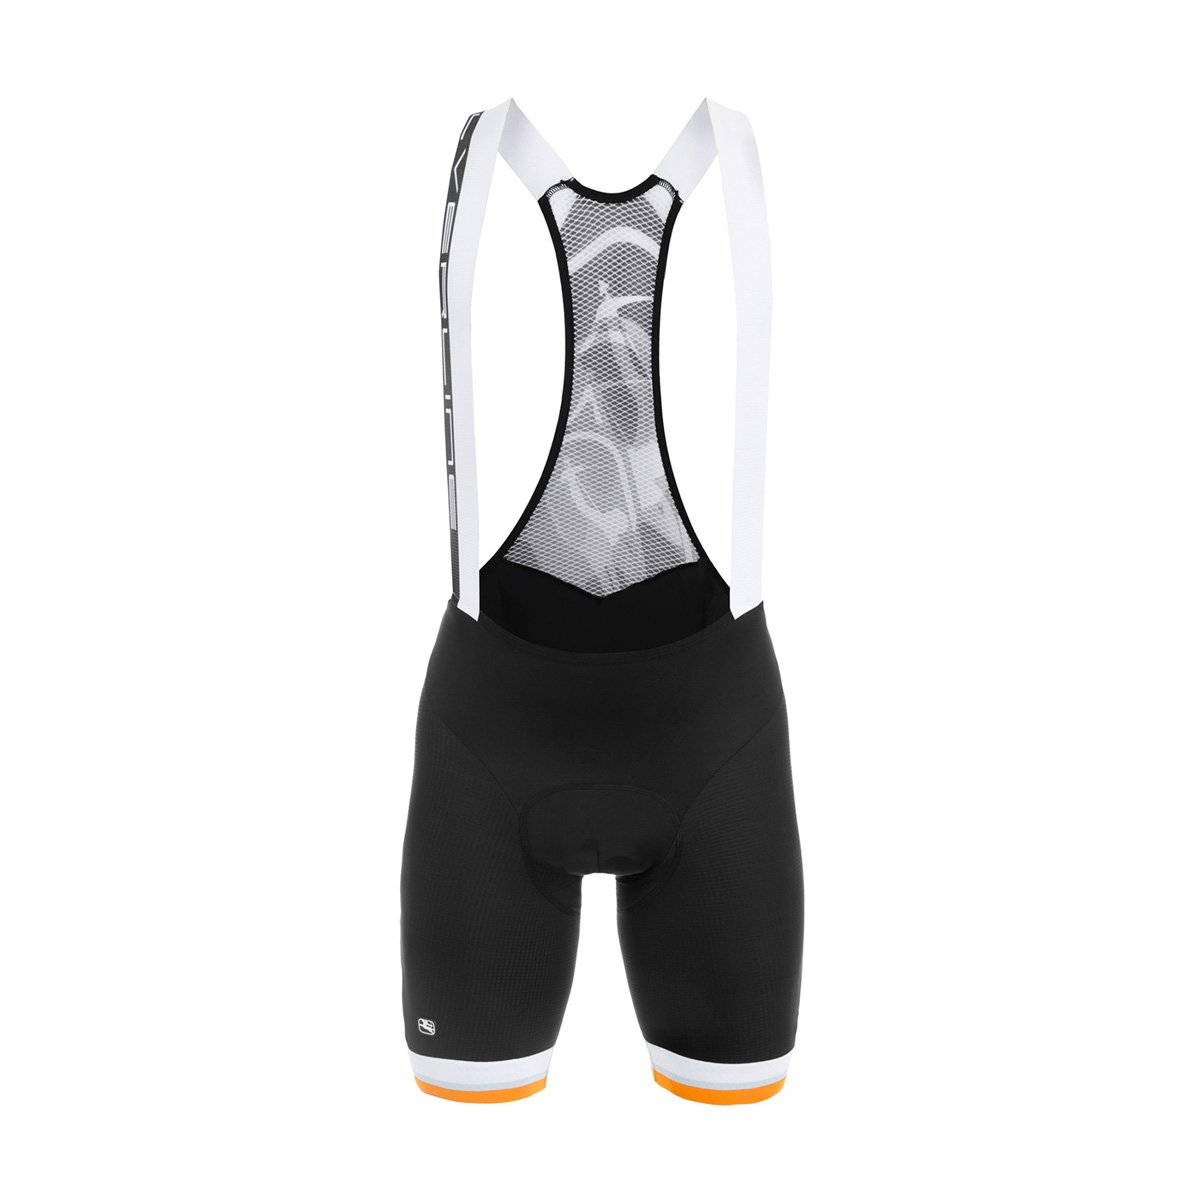 Giordana メンズ シルバーライン サイクリング ビブショーツ - GI-S6-BIBS-SILV Large Black/Orange Accents B01AGTOQDQ